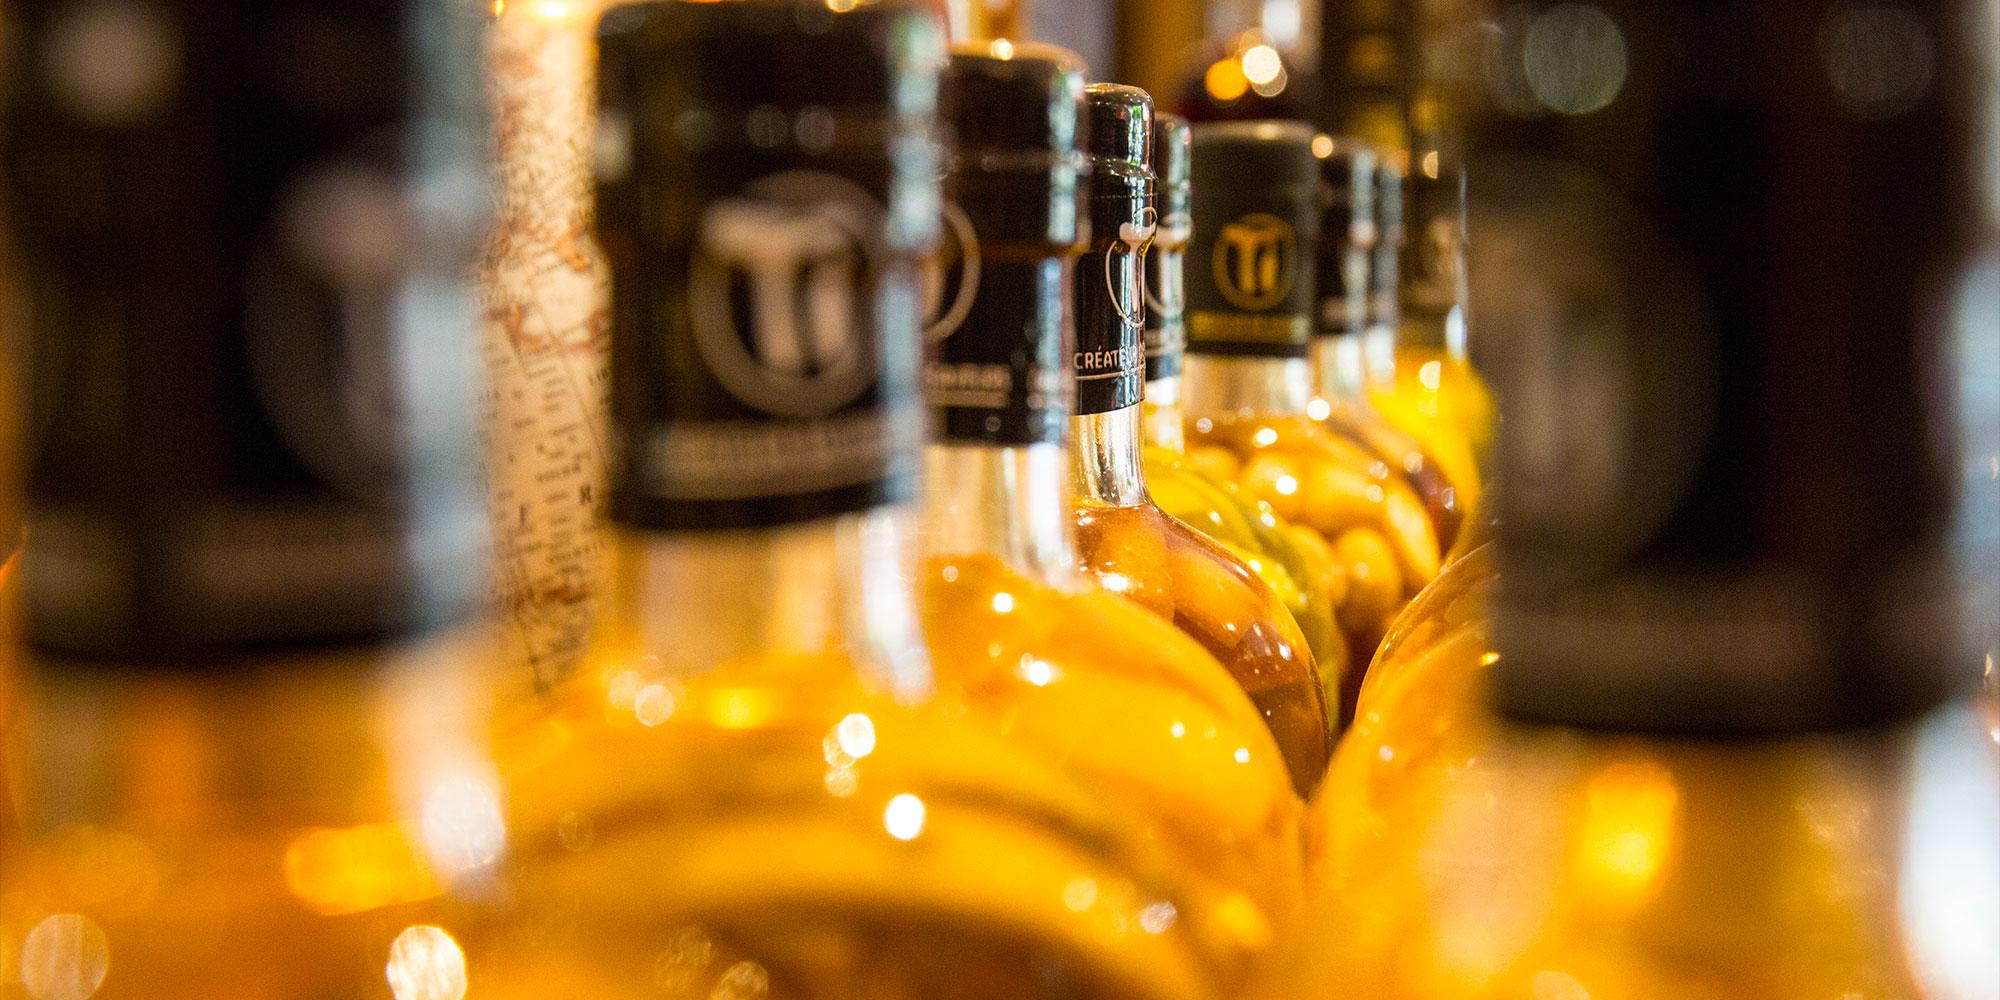 caves bérigny vins et alcools forts